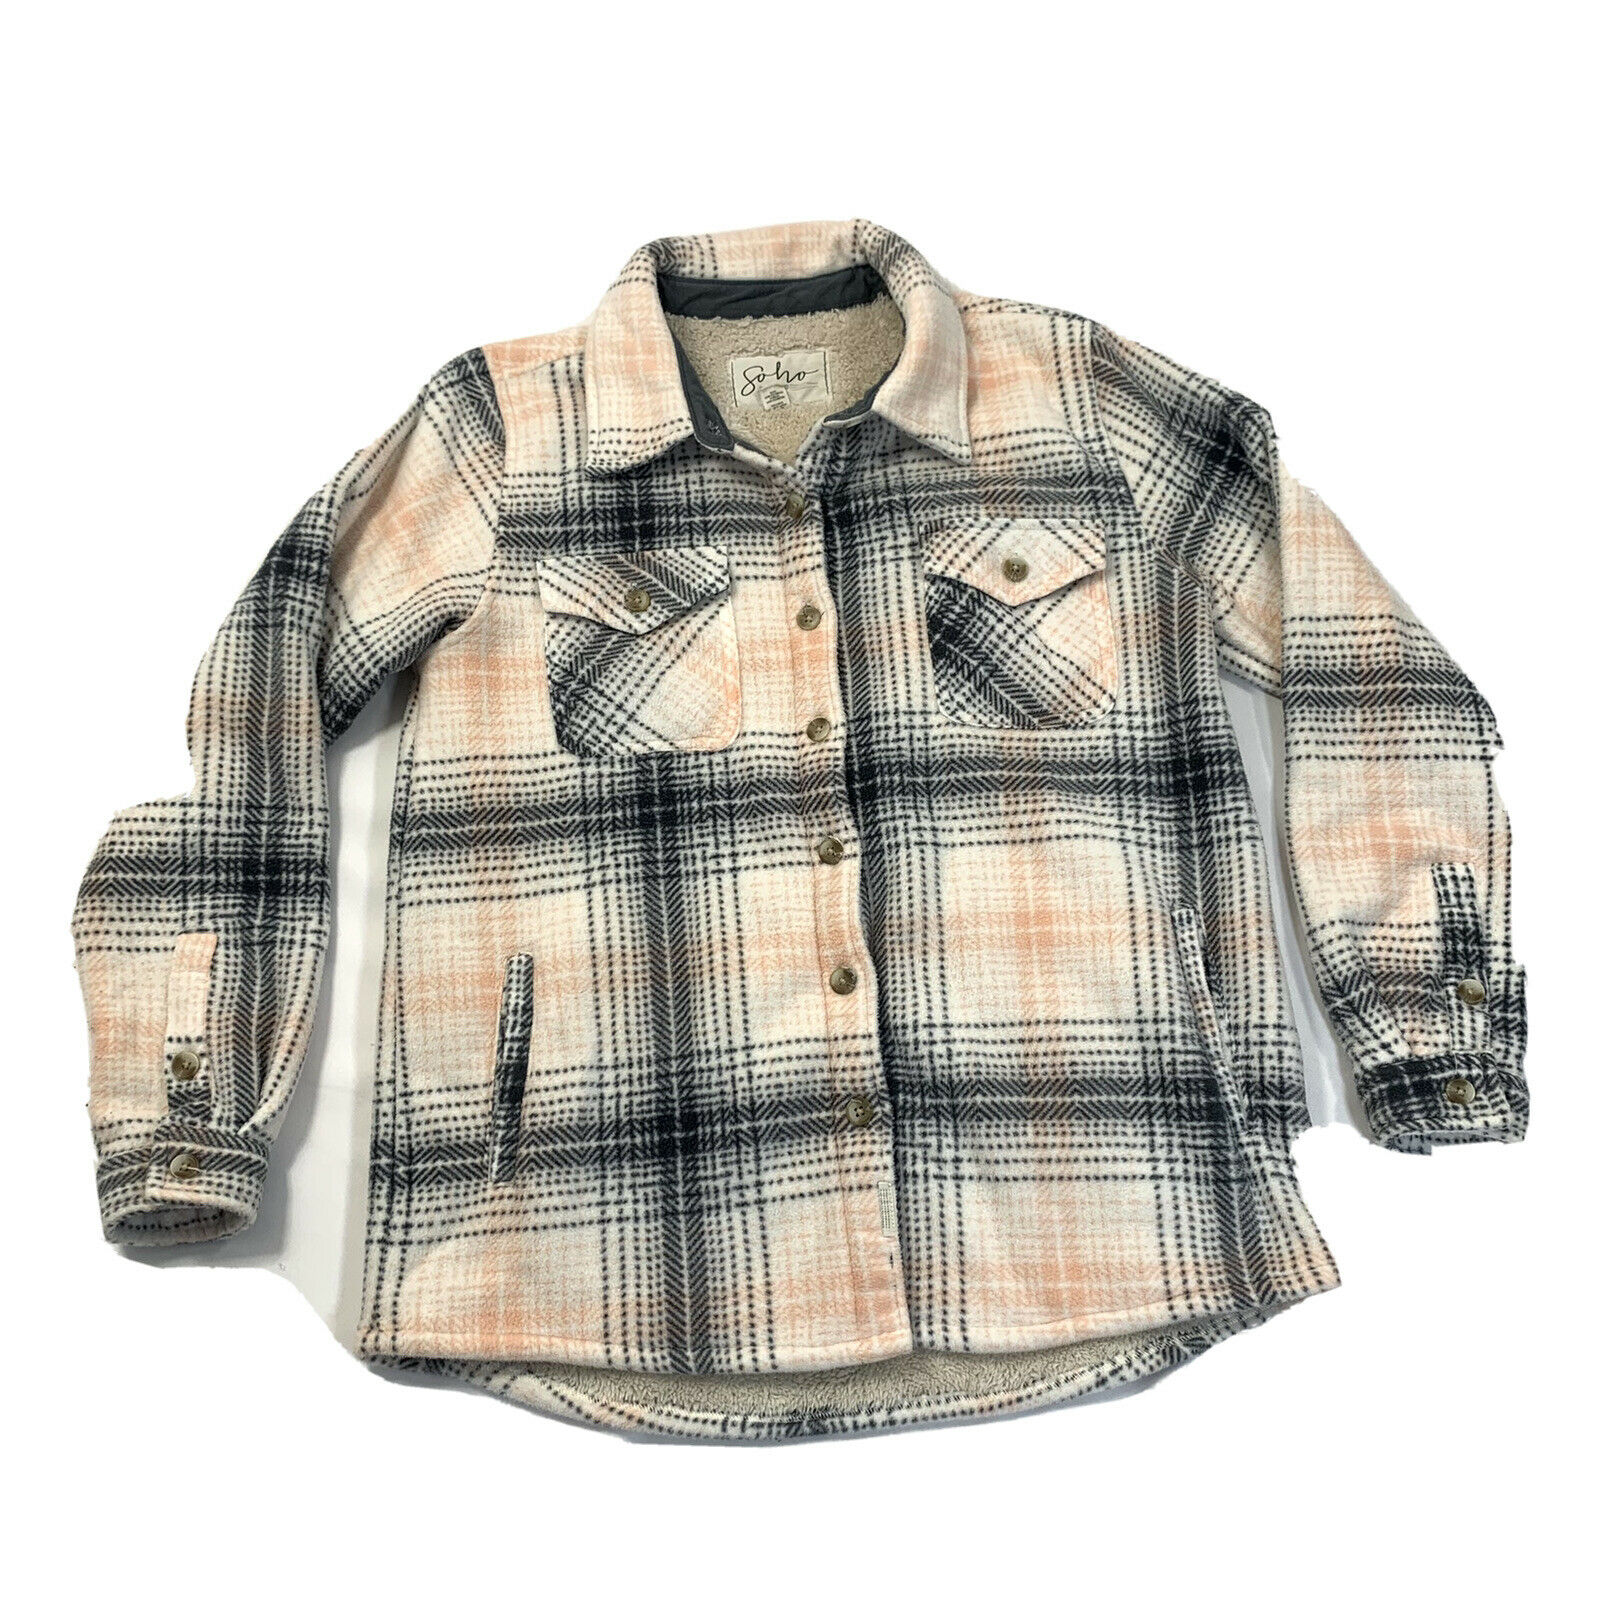 Soho Threads Womens Medium Sherpa Lined Plaid Flannel Shirt Jacket